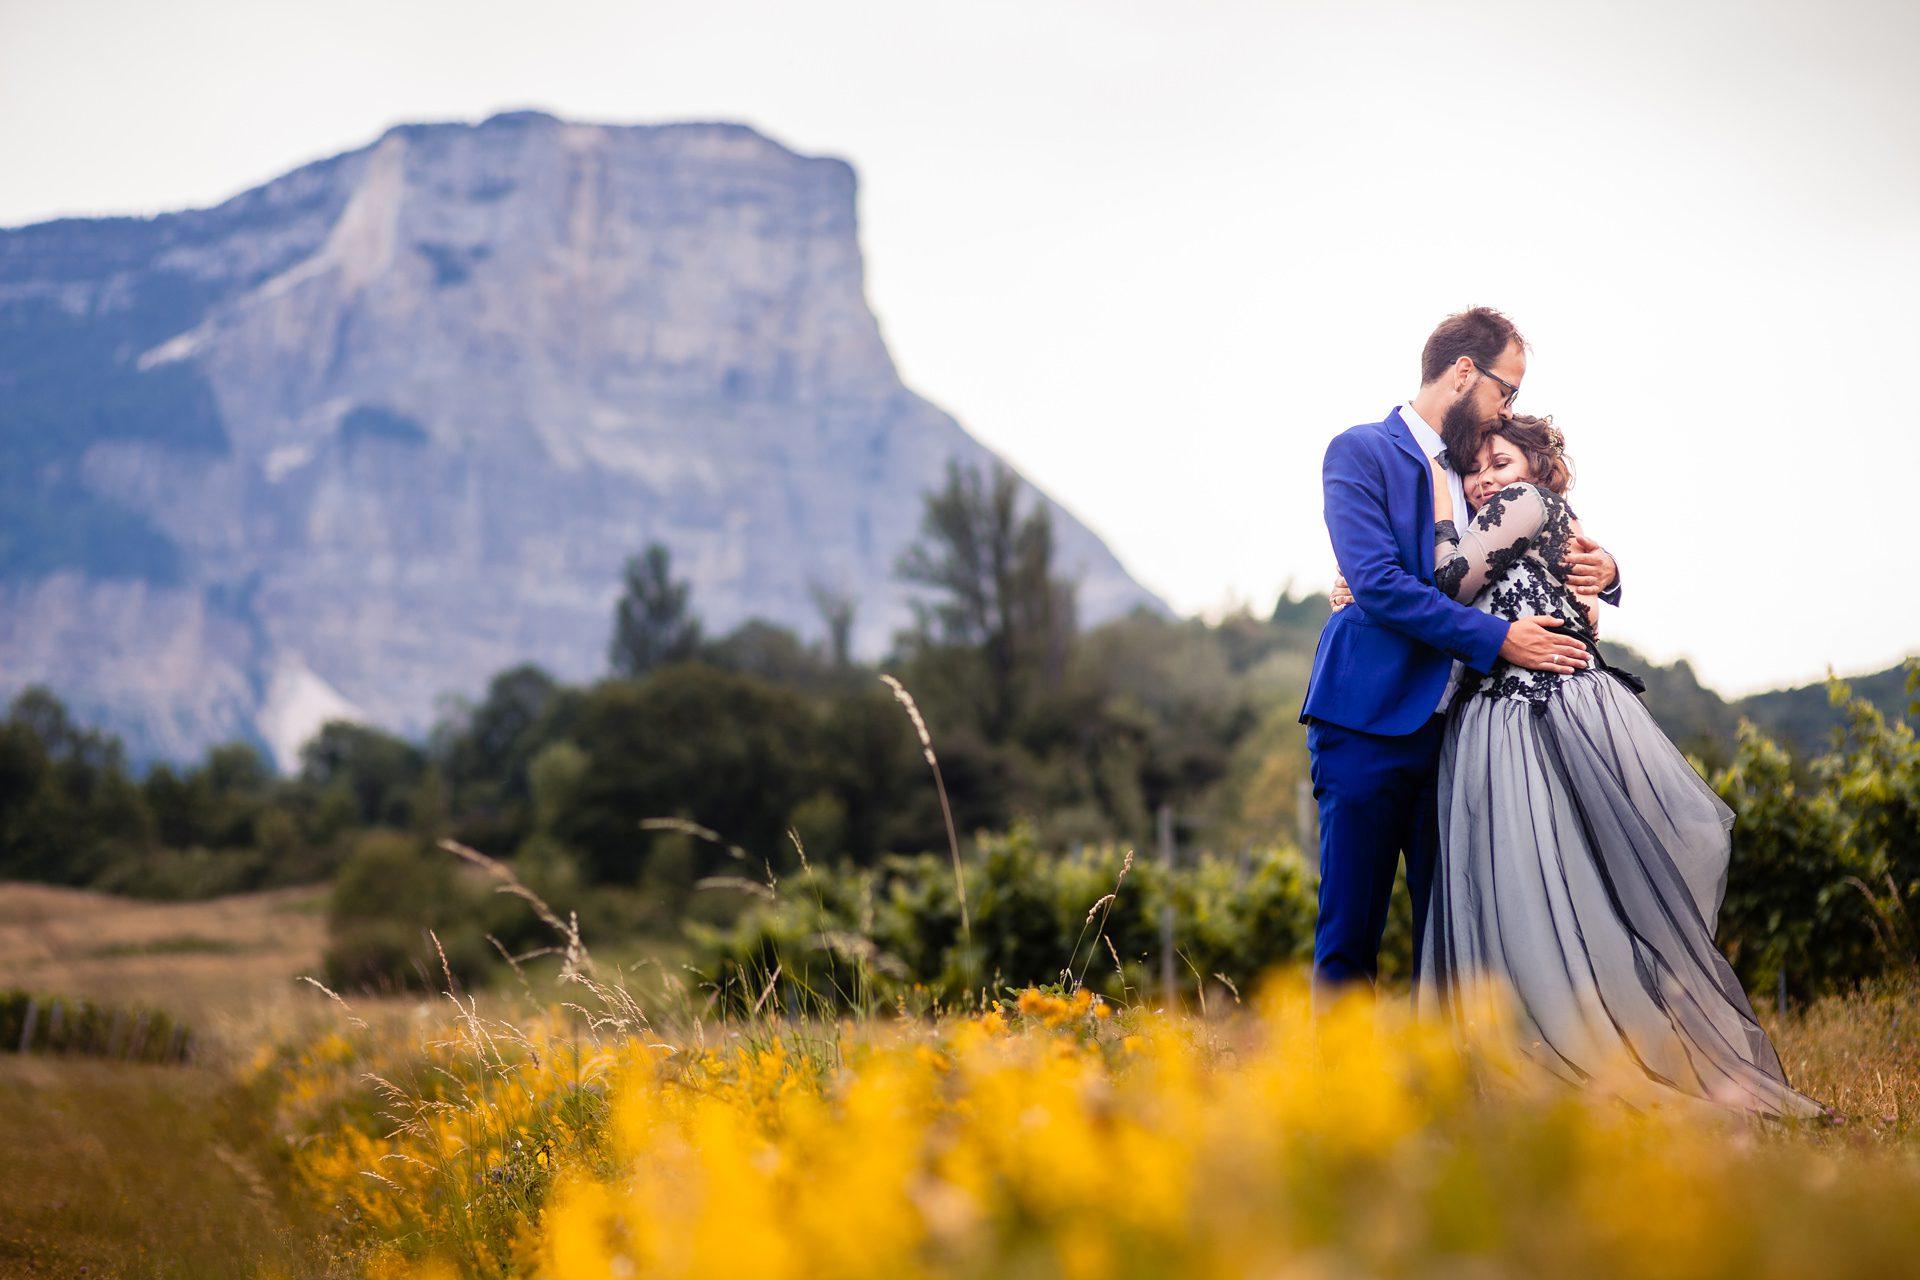 Photographe de mariage en Chartreuse - Chambéry